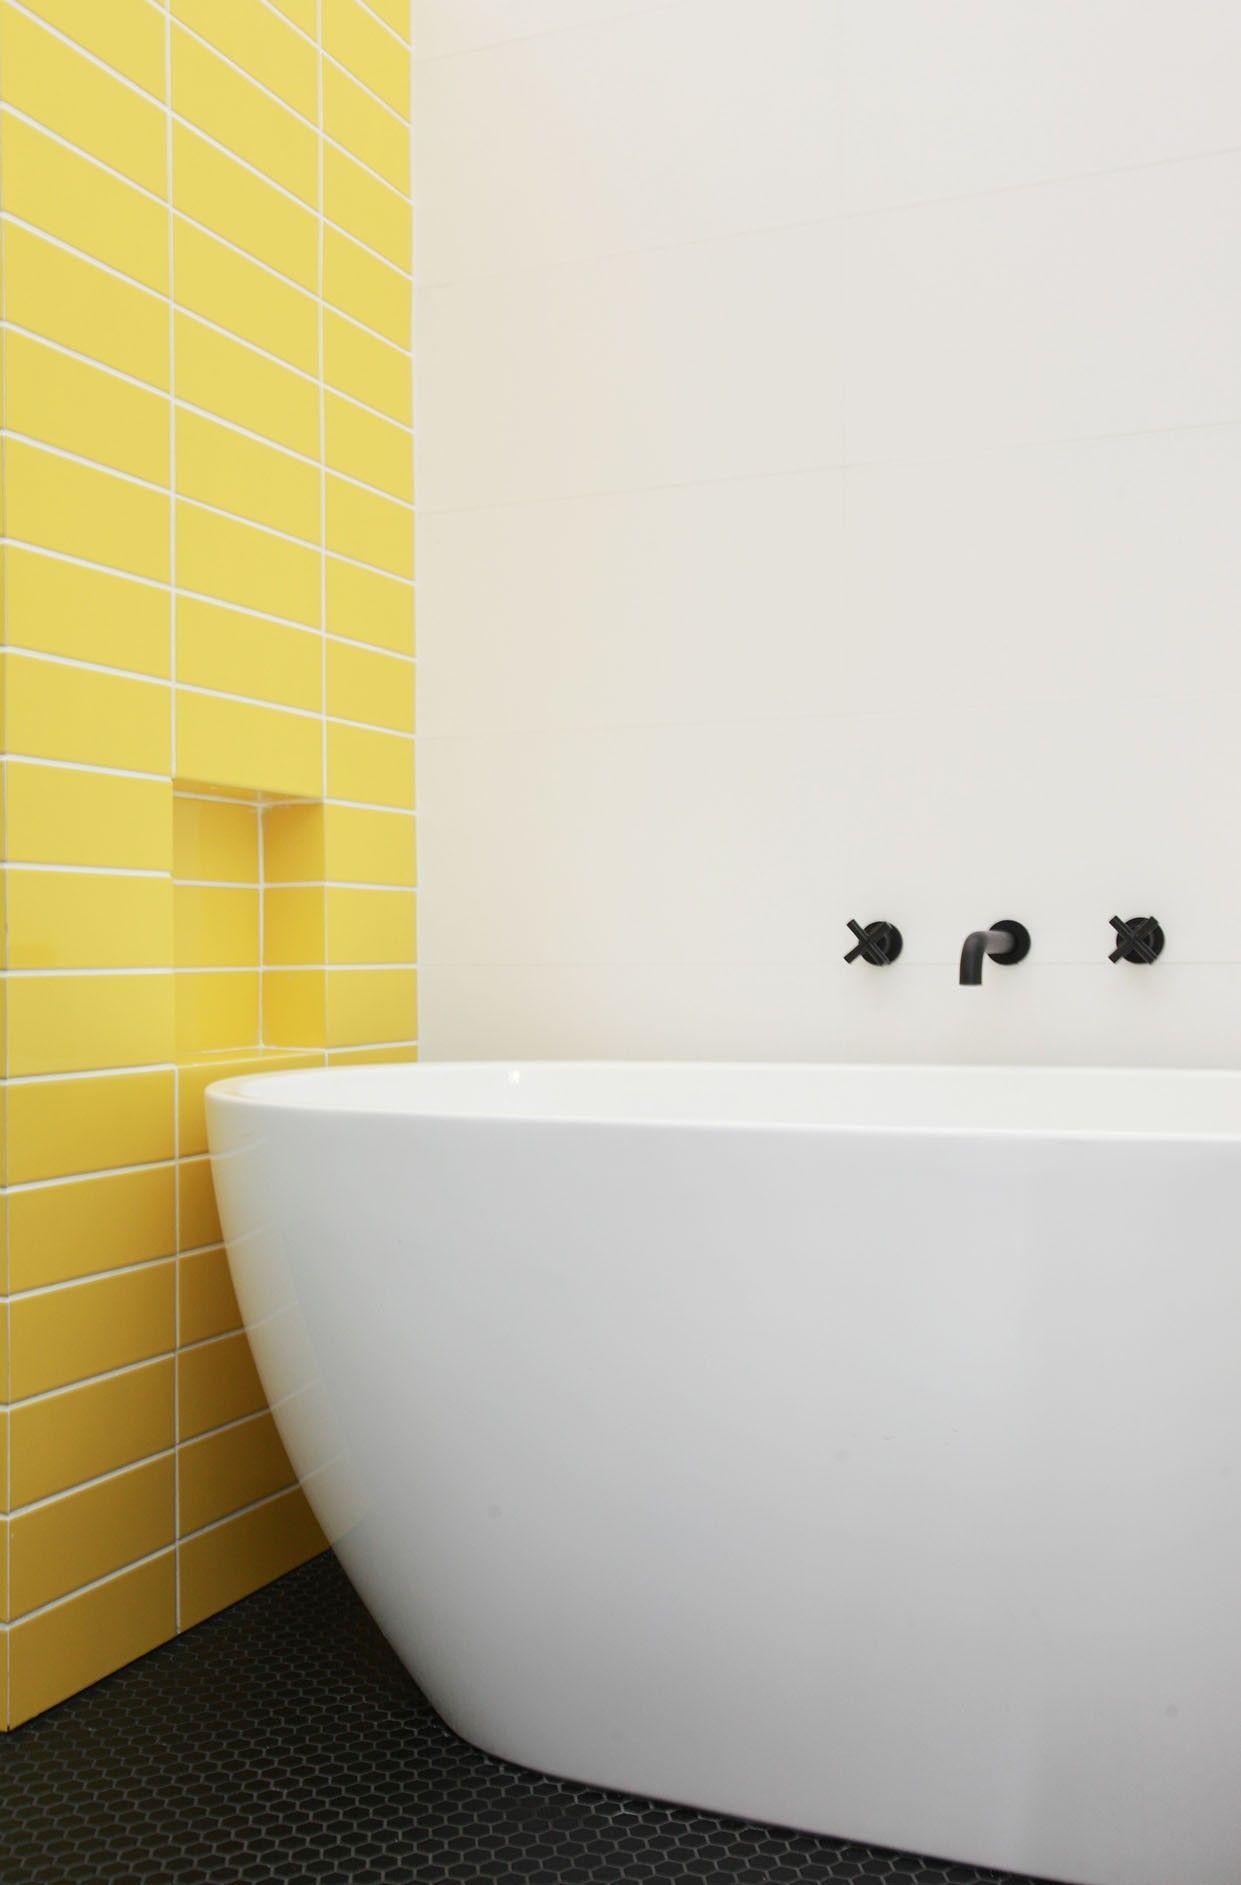 Pink Marble Ideas Pretty Enough To Make You Blush Yellow Bathroom Decor Yellow Bathroom Tiles Yellow Bathrooms